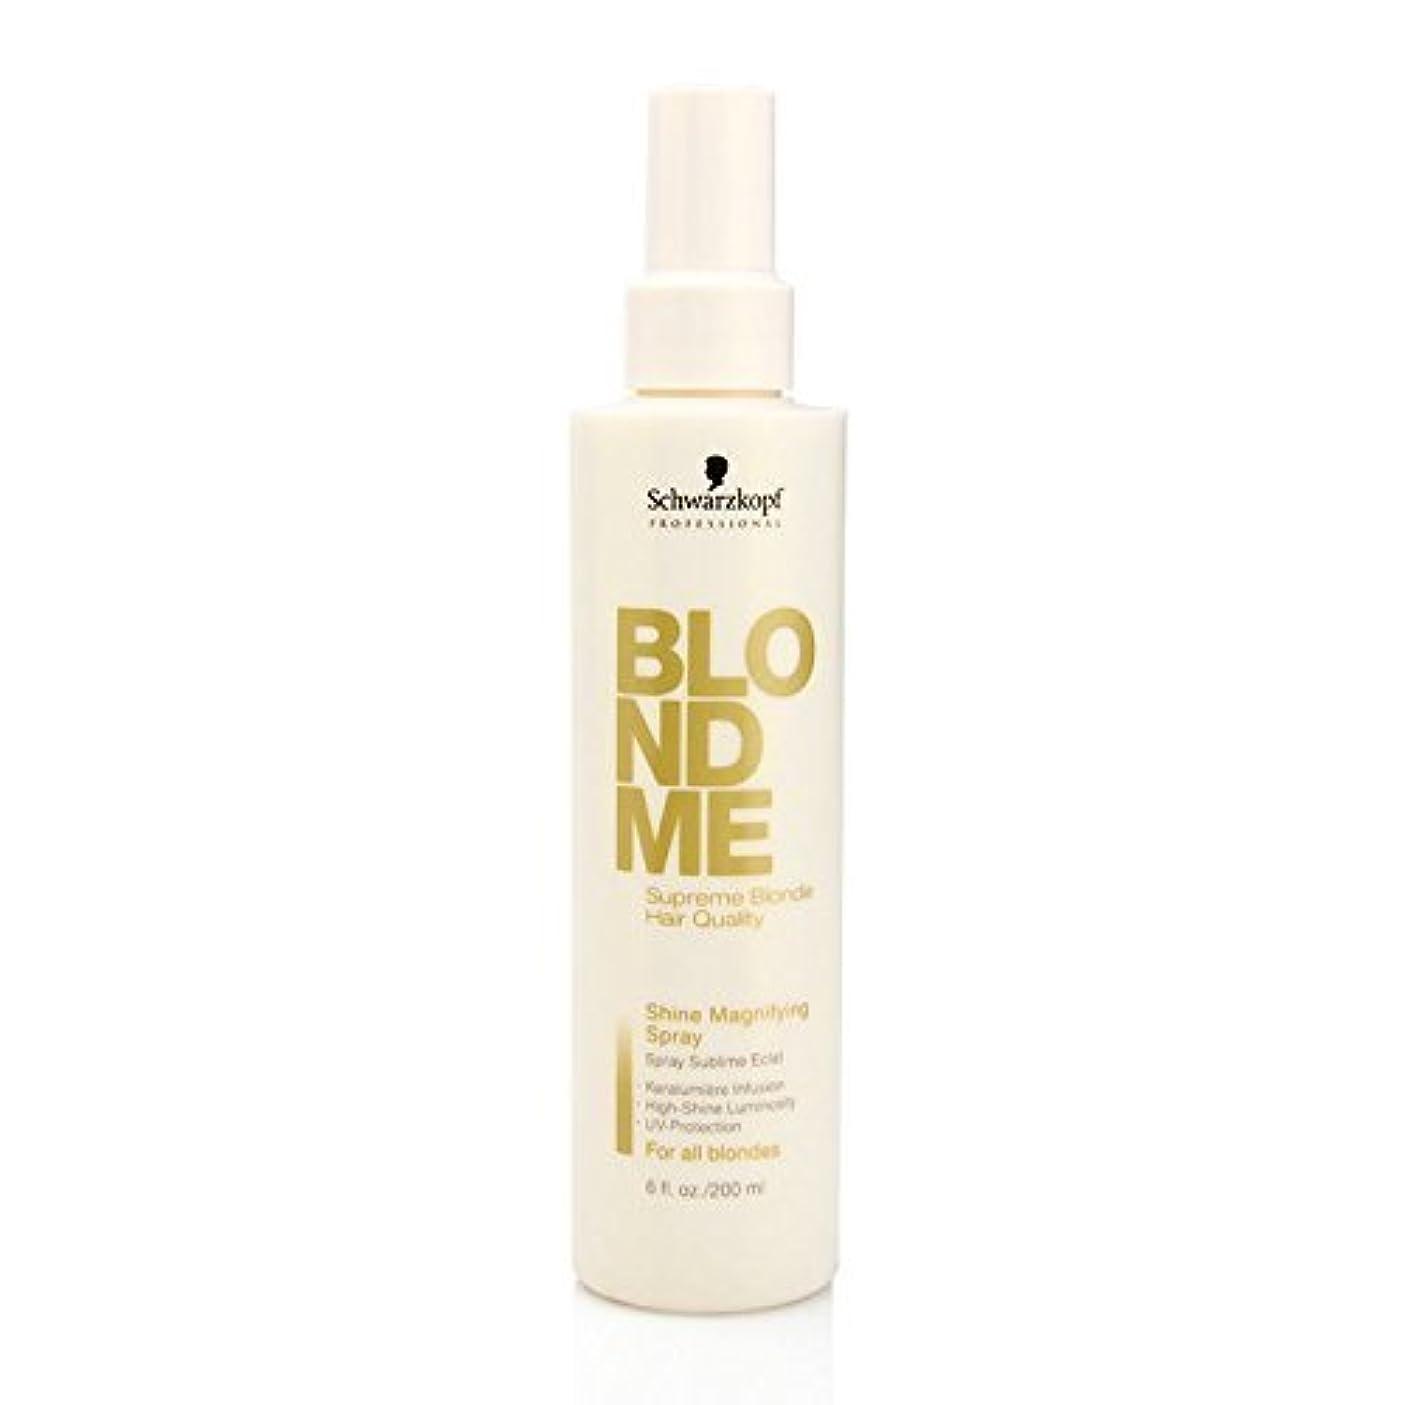 by Blondme SHINE MAGINYING SPARY 6 OZ by BLONDME